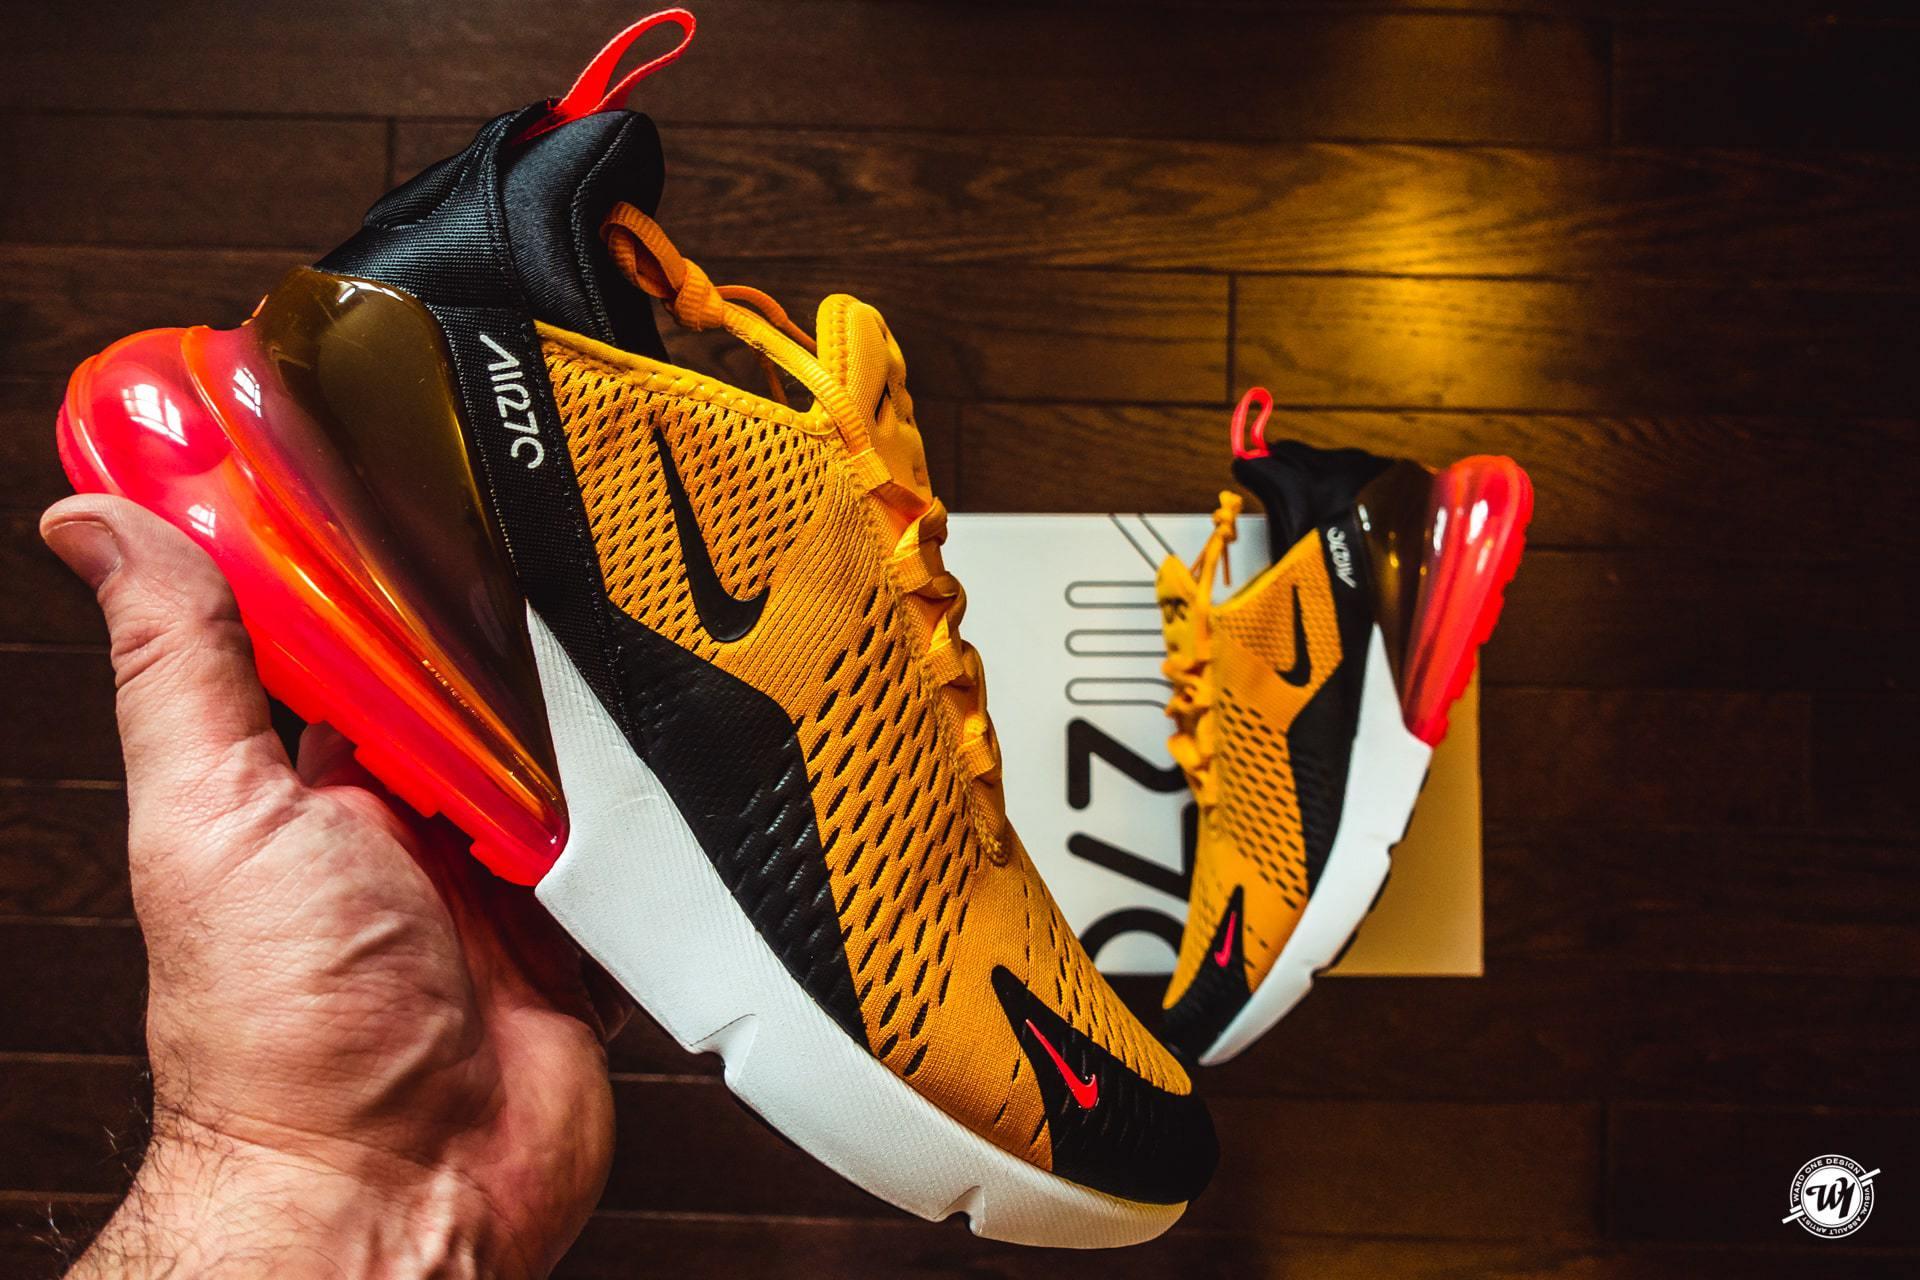 Nike Air Max 270 • University Gold/ Hot Punch